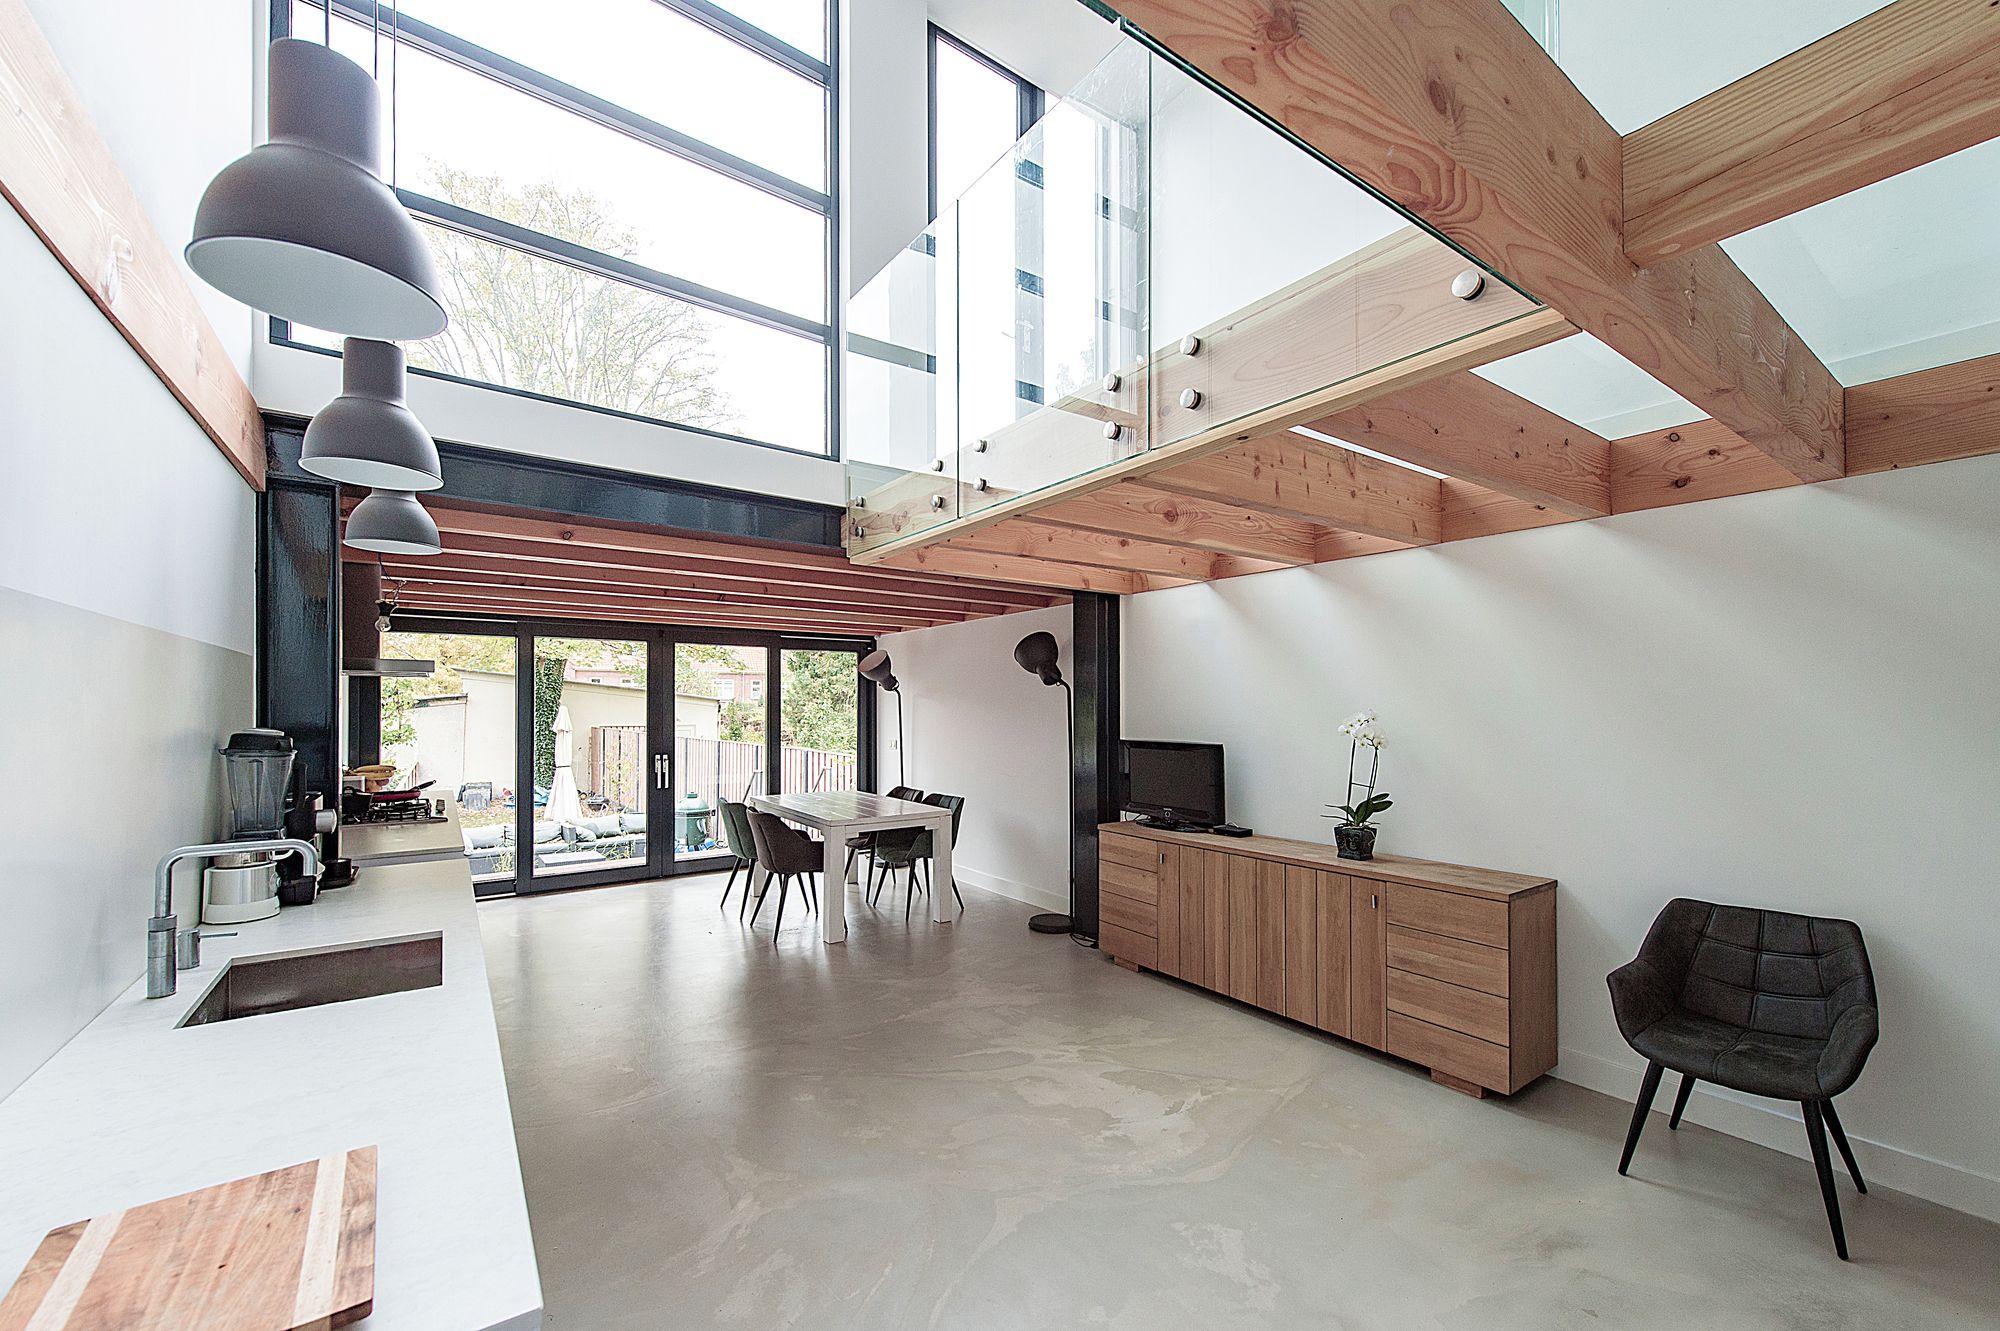 Gulfstream g650 interior bedroom house overveen  bloot architecture  architecture  pinterest